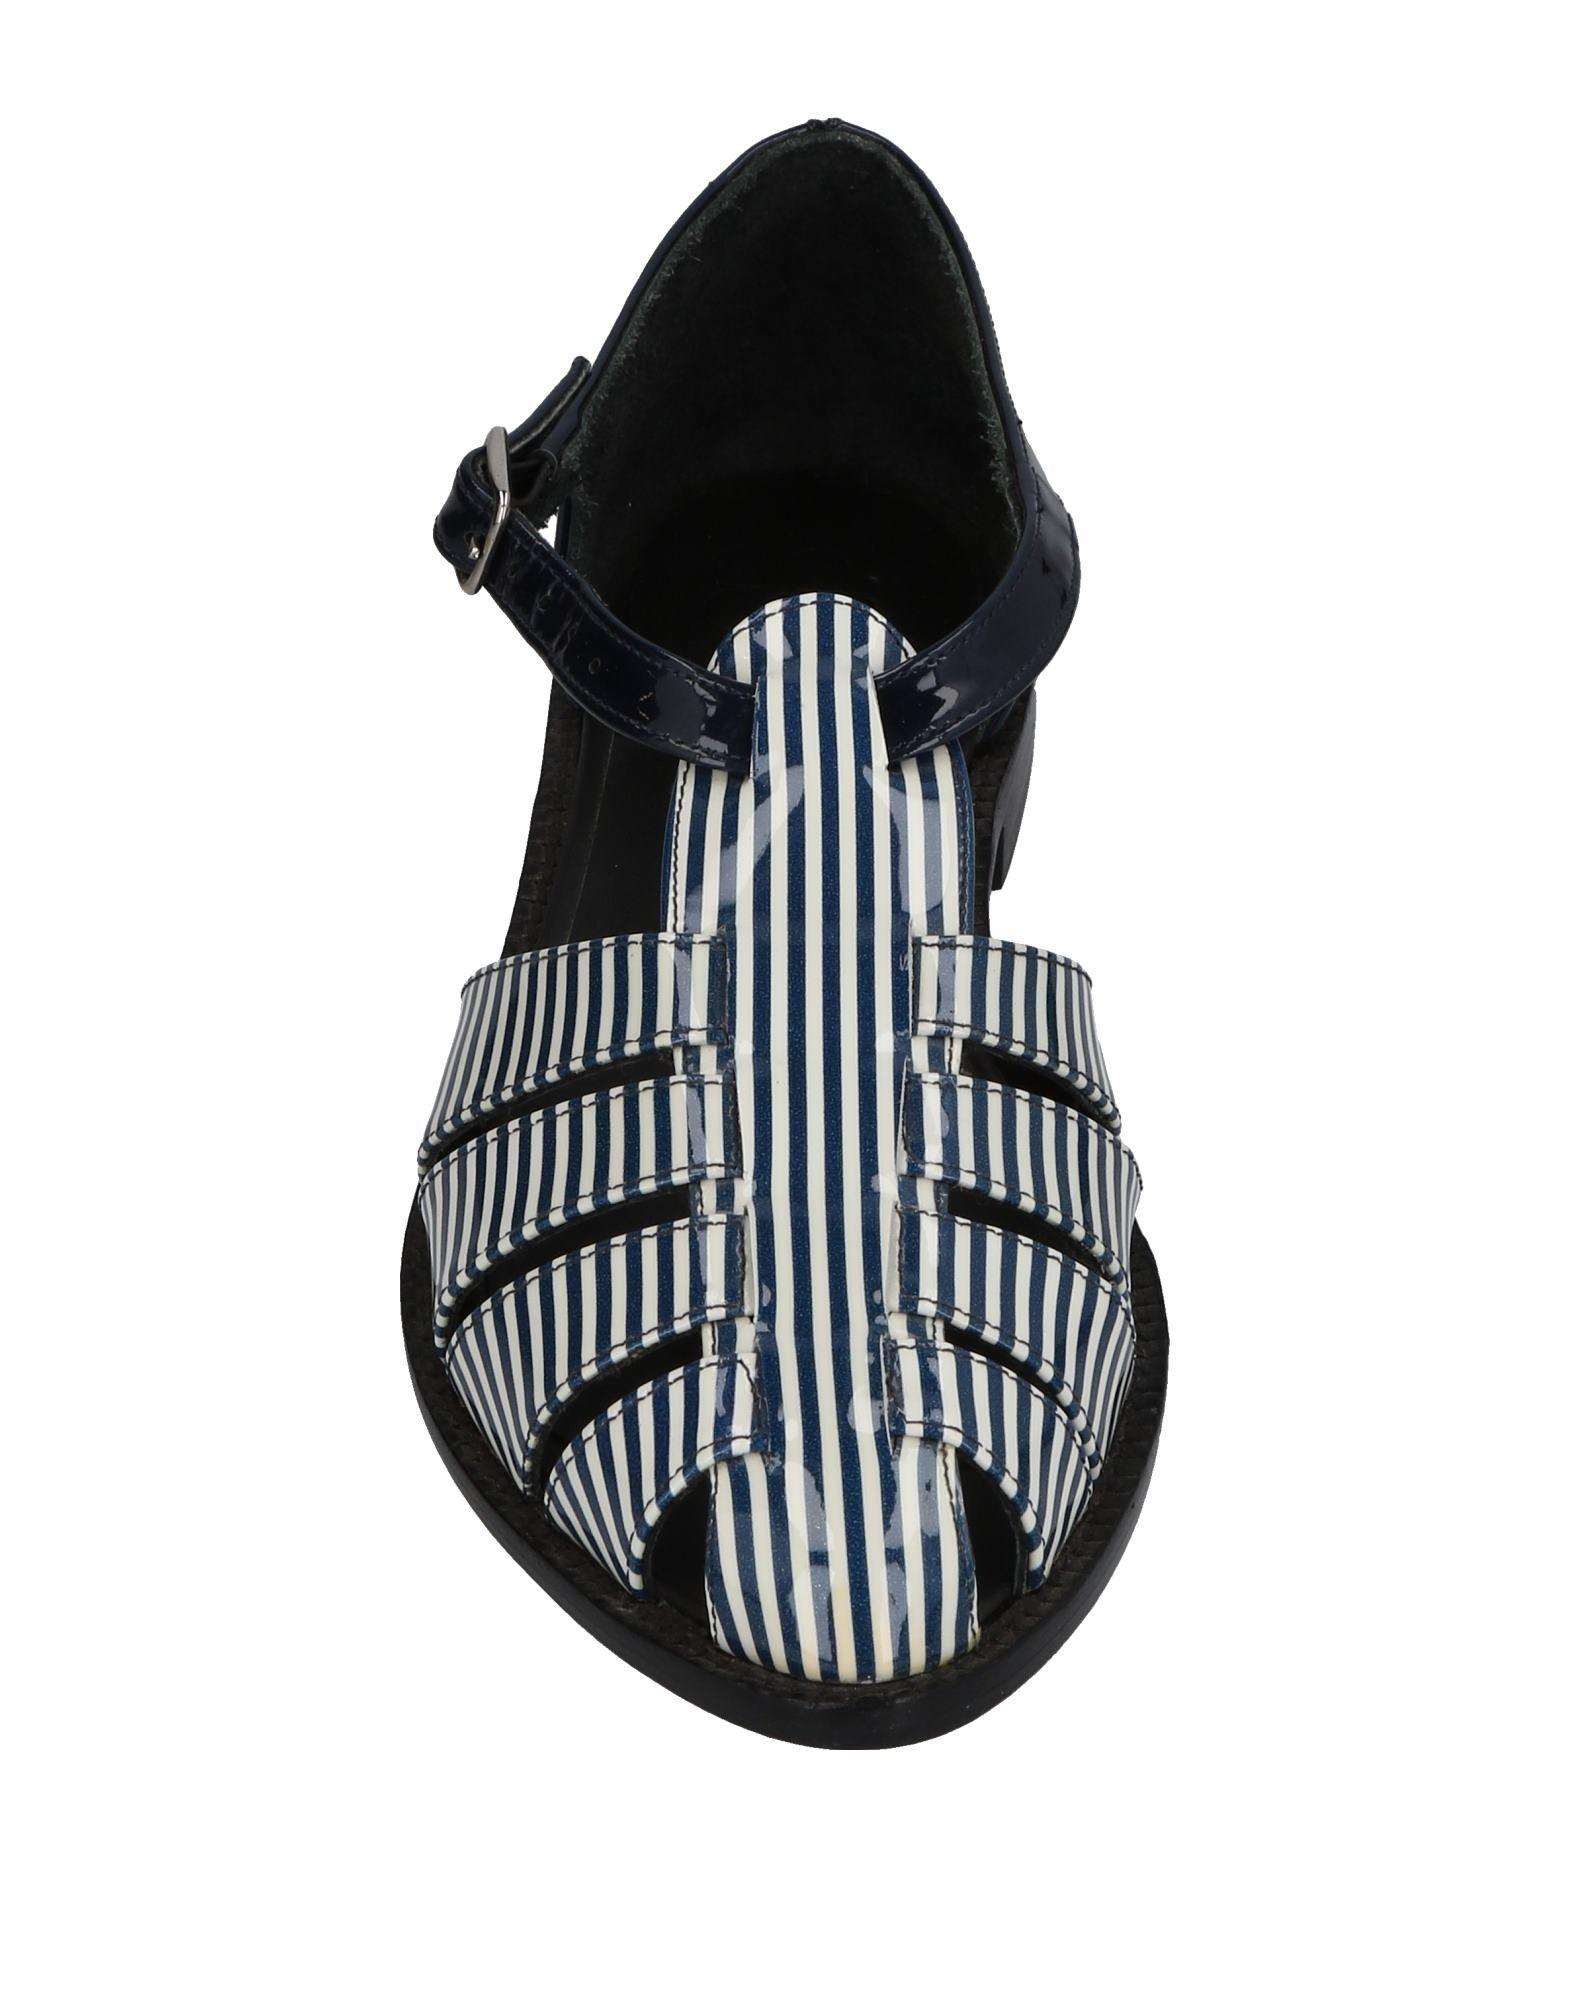 Sandales Naguisa Femme - Sandales Naguisa sur